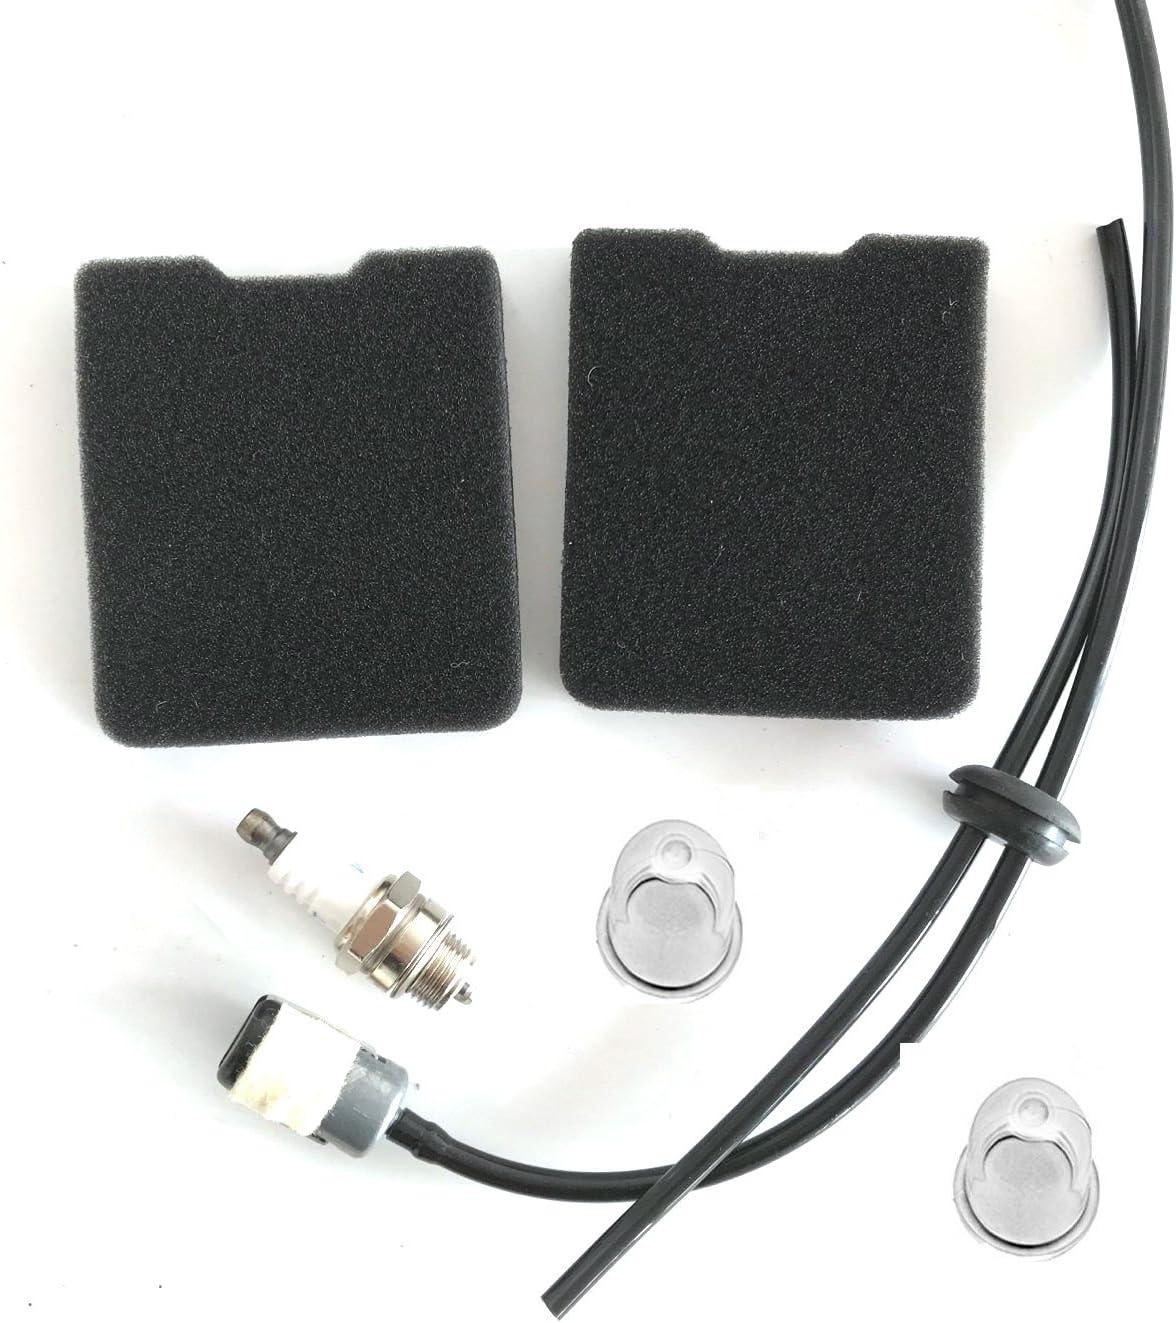 Tuneup Service Kit Fuel Line For HUSQVARNA 145BT 155BT 145BF 53100443 Air Filter